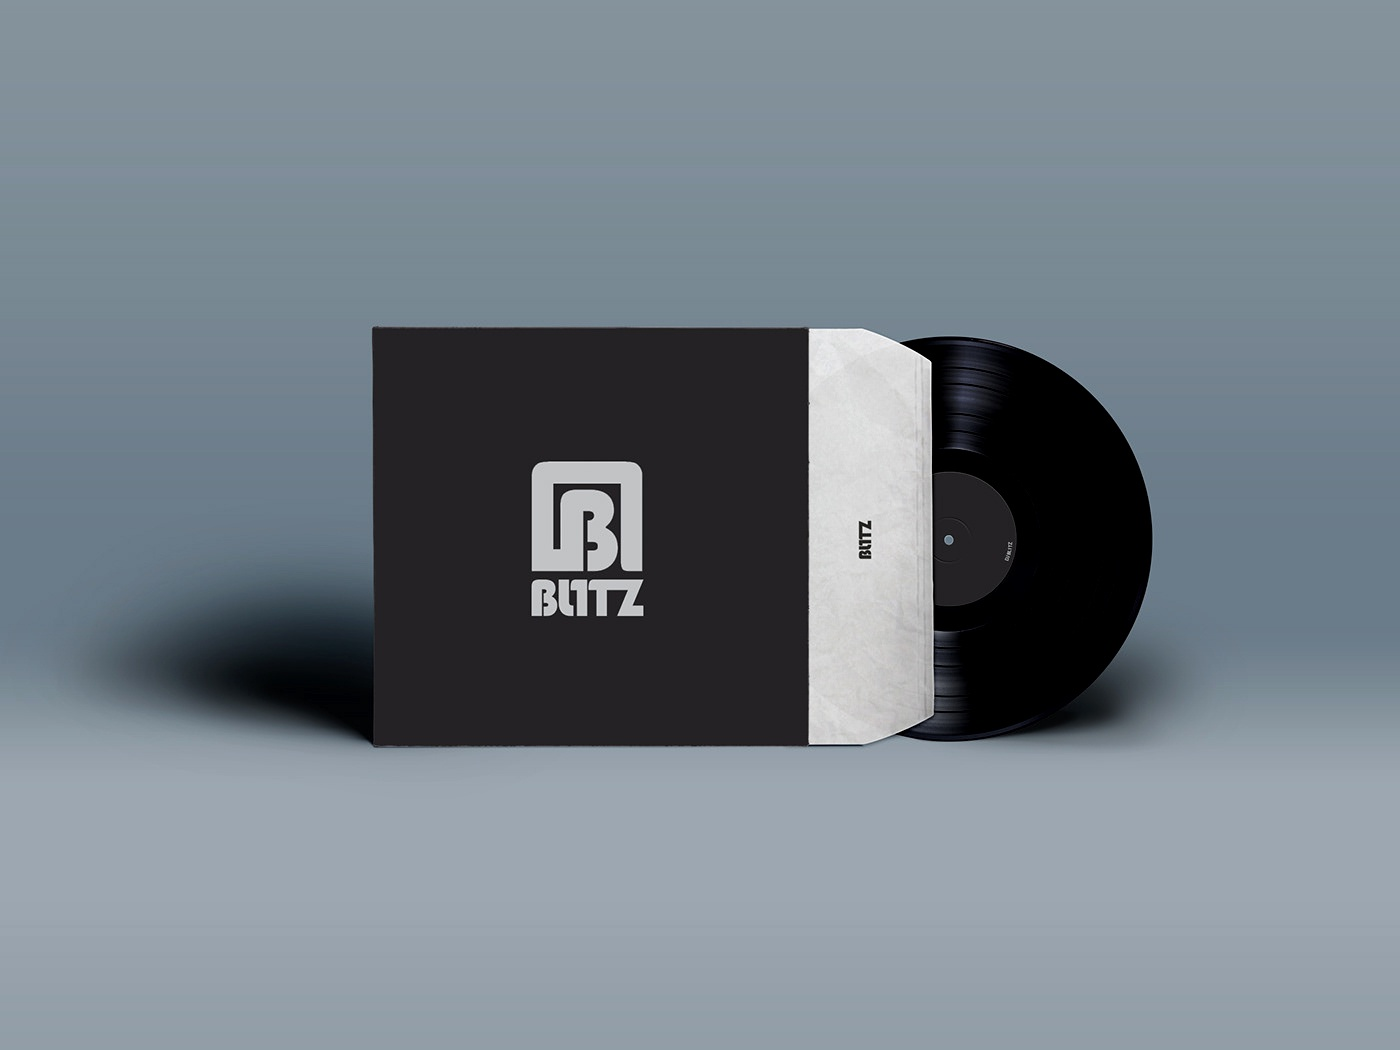 Bl1tz music typography vector illustrator logo illustration design